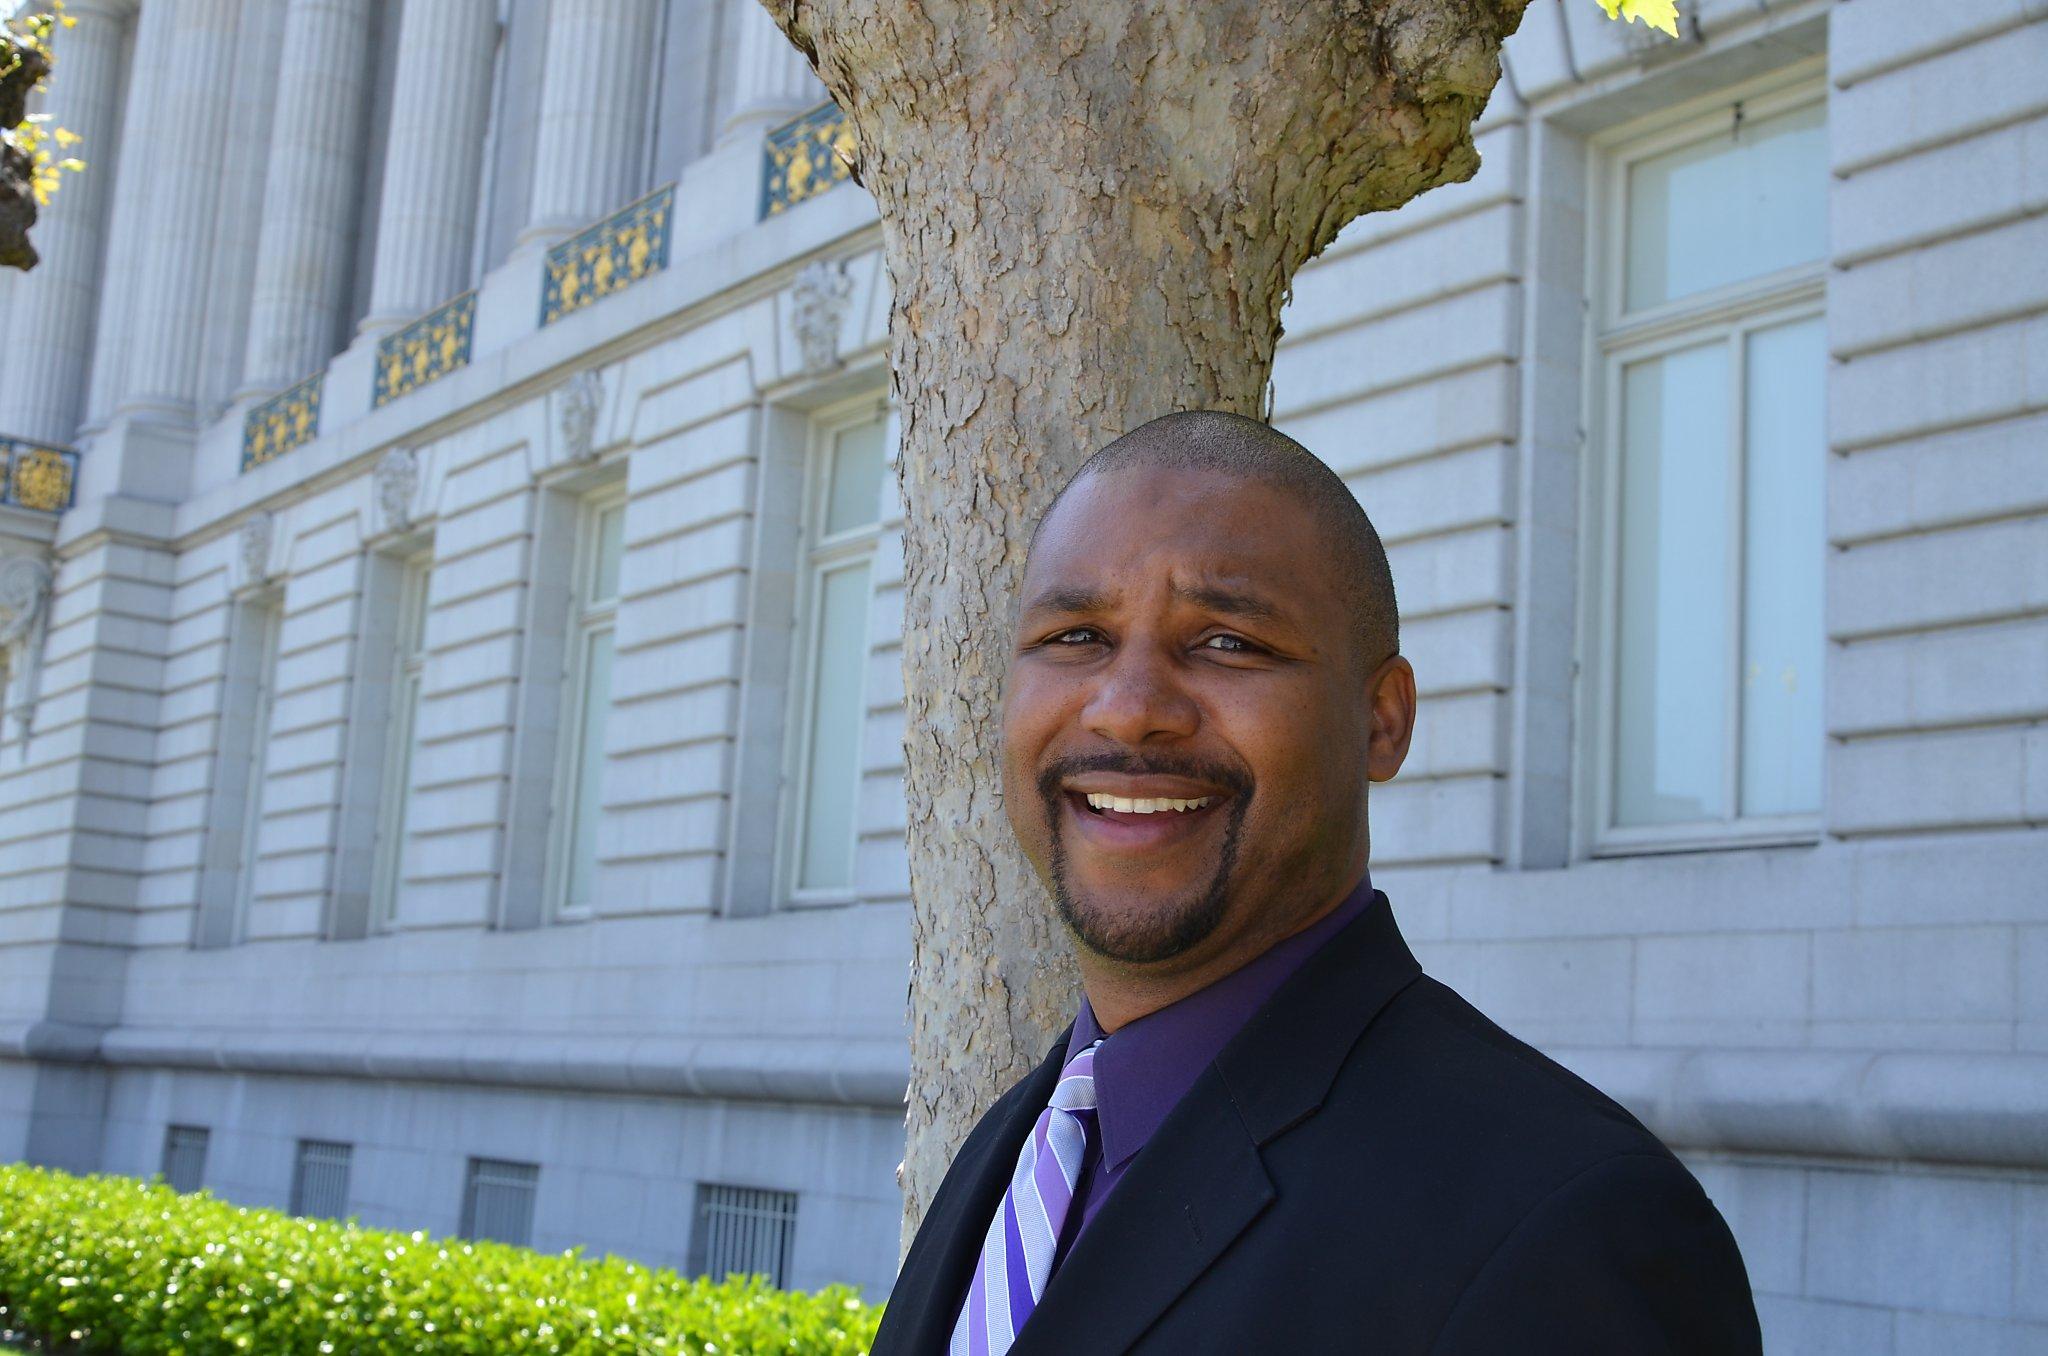 Supervisor Walton says SF cigar bar discriminated against him and his friends